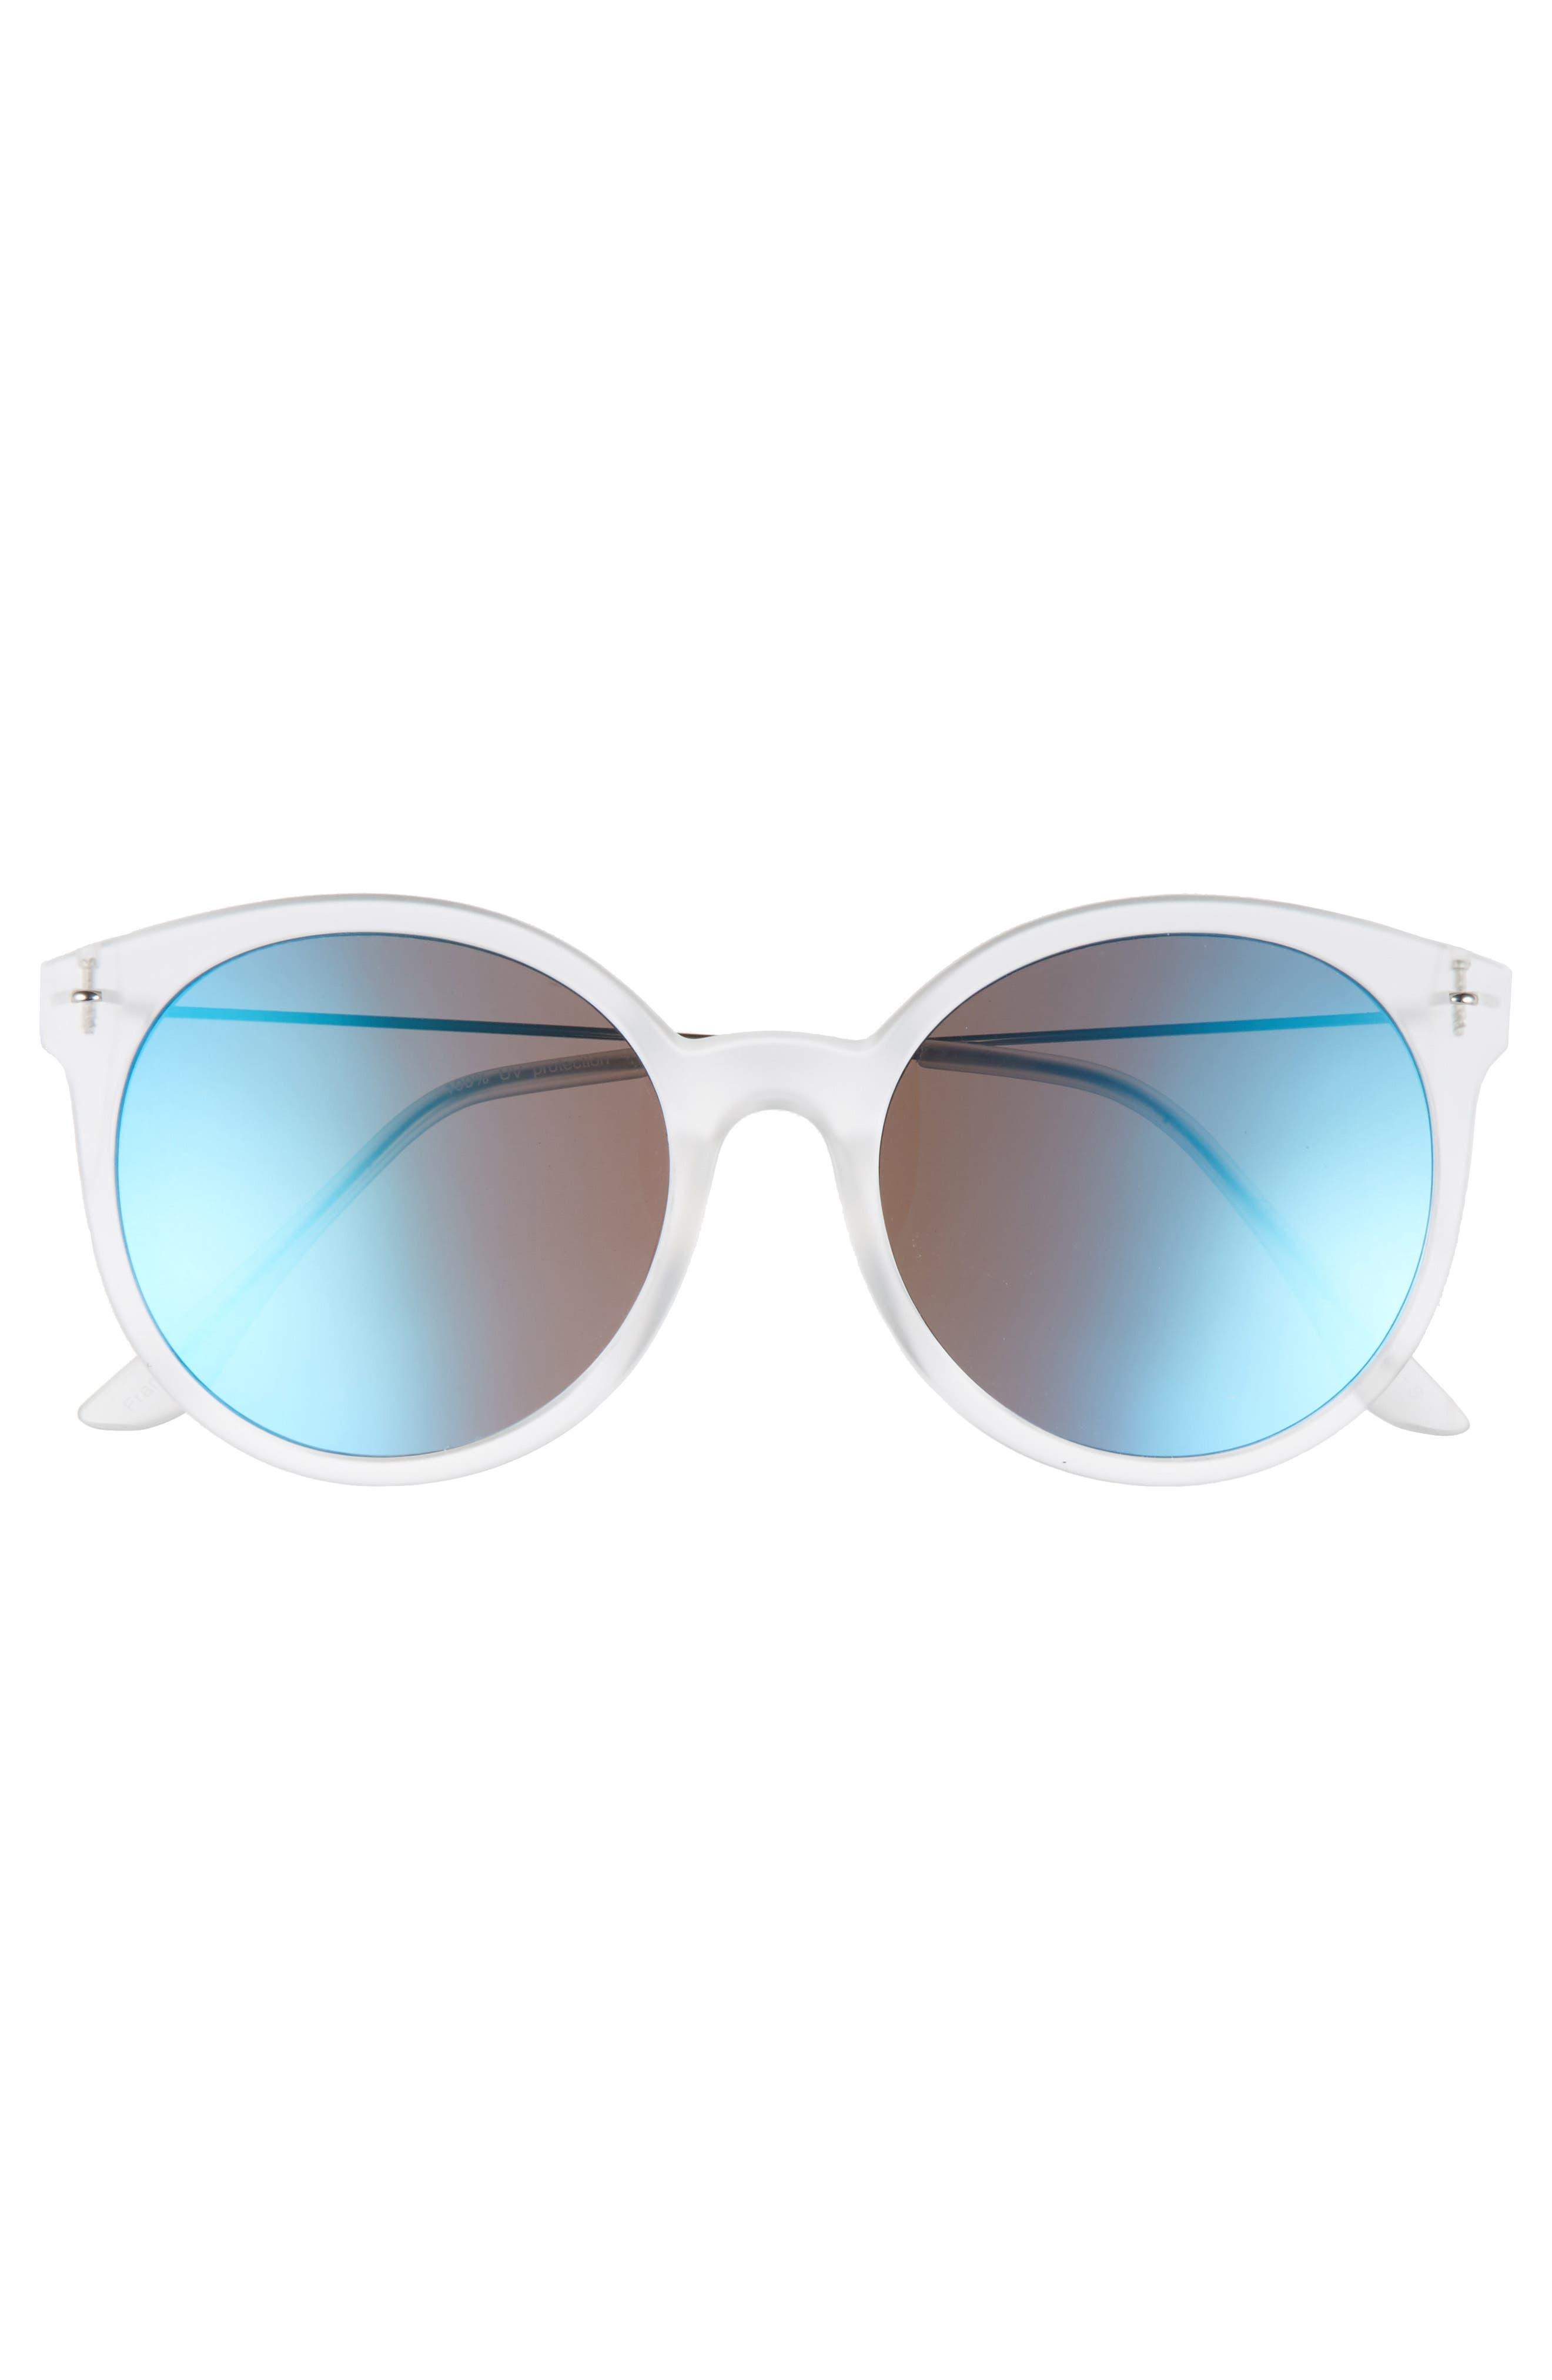 62mm Transparent Round Lens Sunglasses,                             Alternate thumbnail 3, color,                             Clear/ Blue